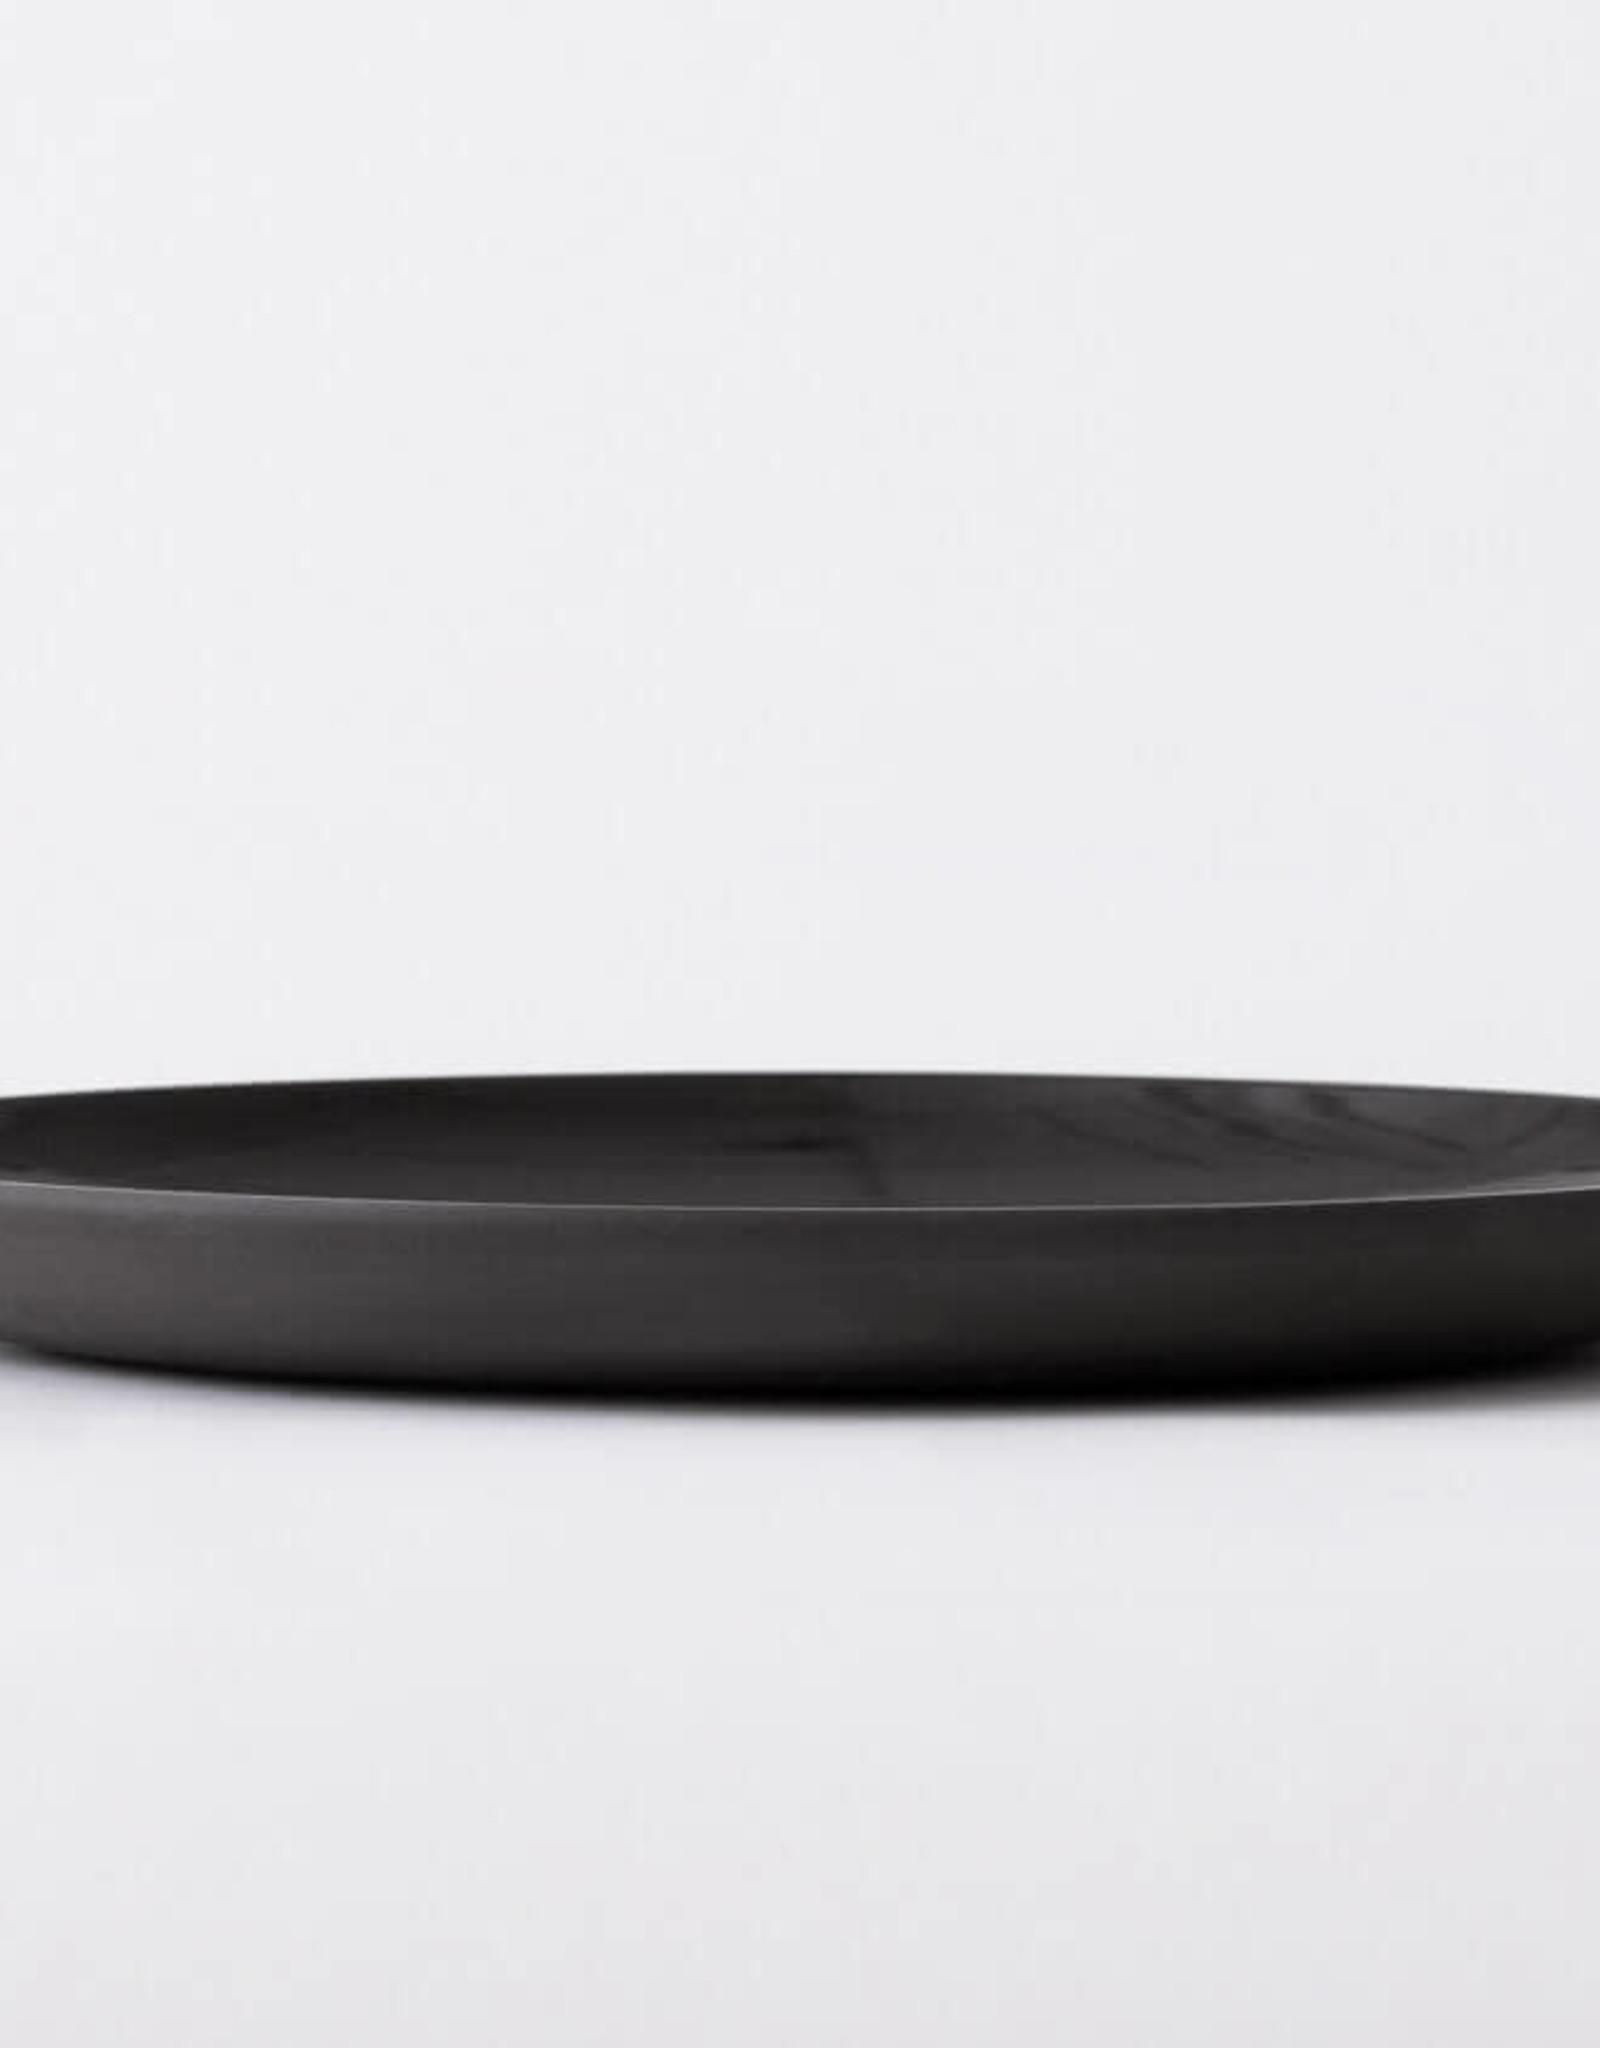 EQ3 EQ3 Garrido Stoneware Dinner Plate-Black